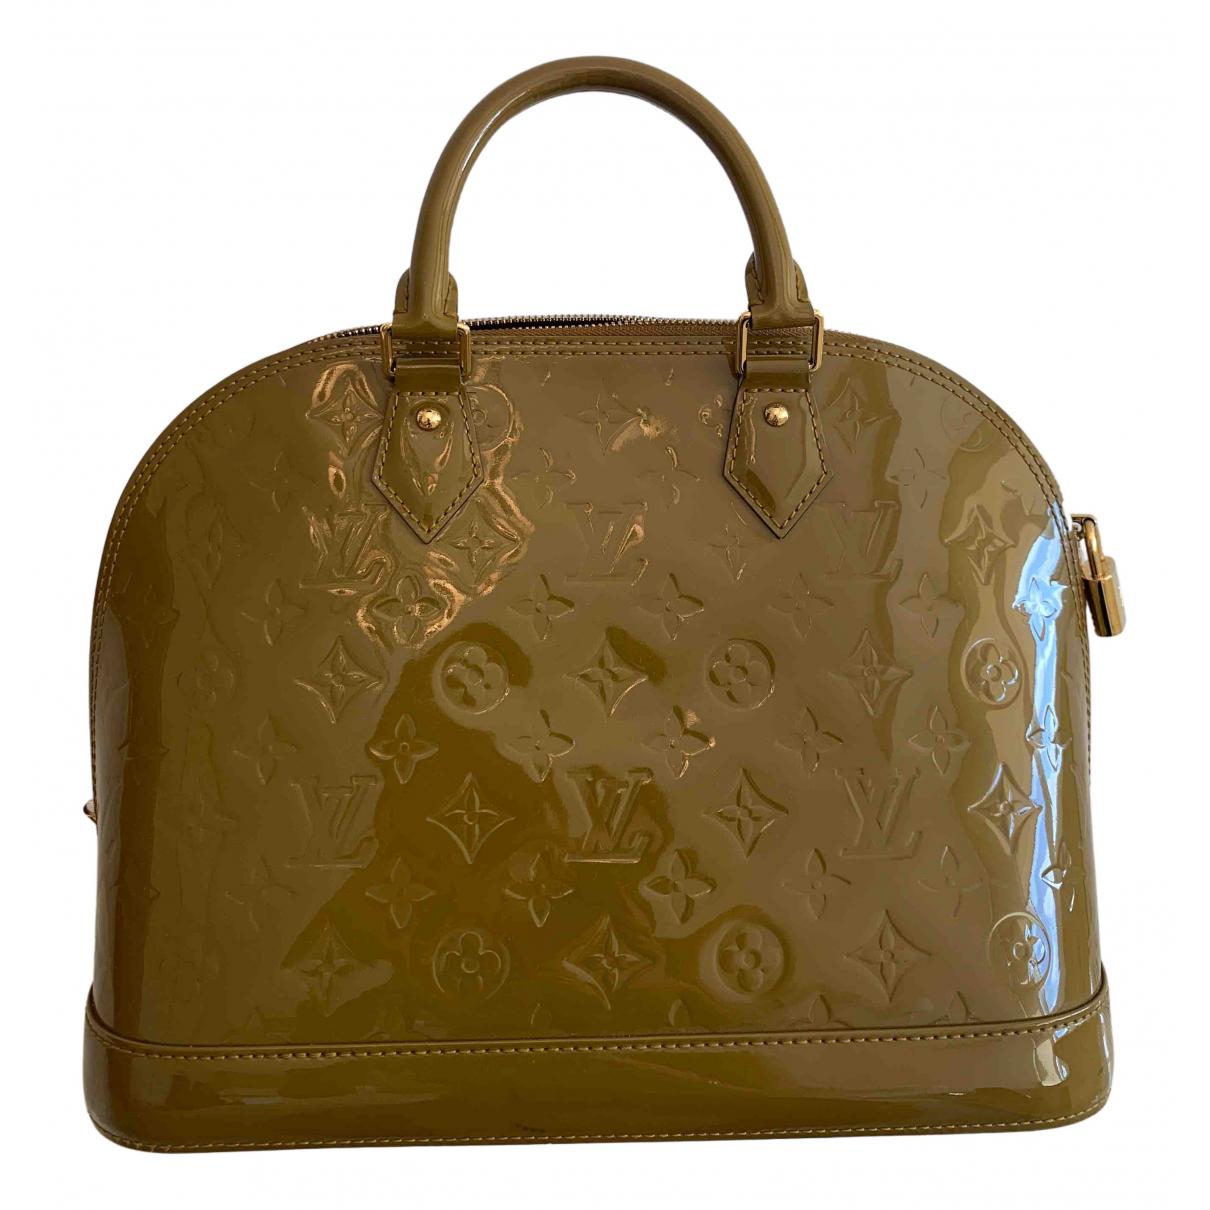 Louis Vuitton Alma Khaki Patent leather handbag for Women N